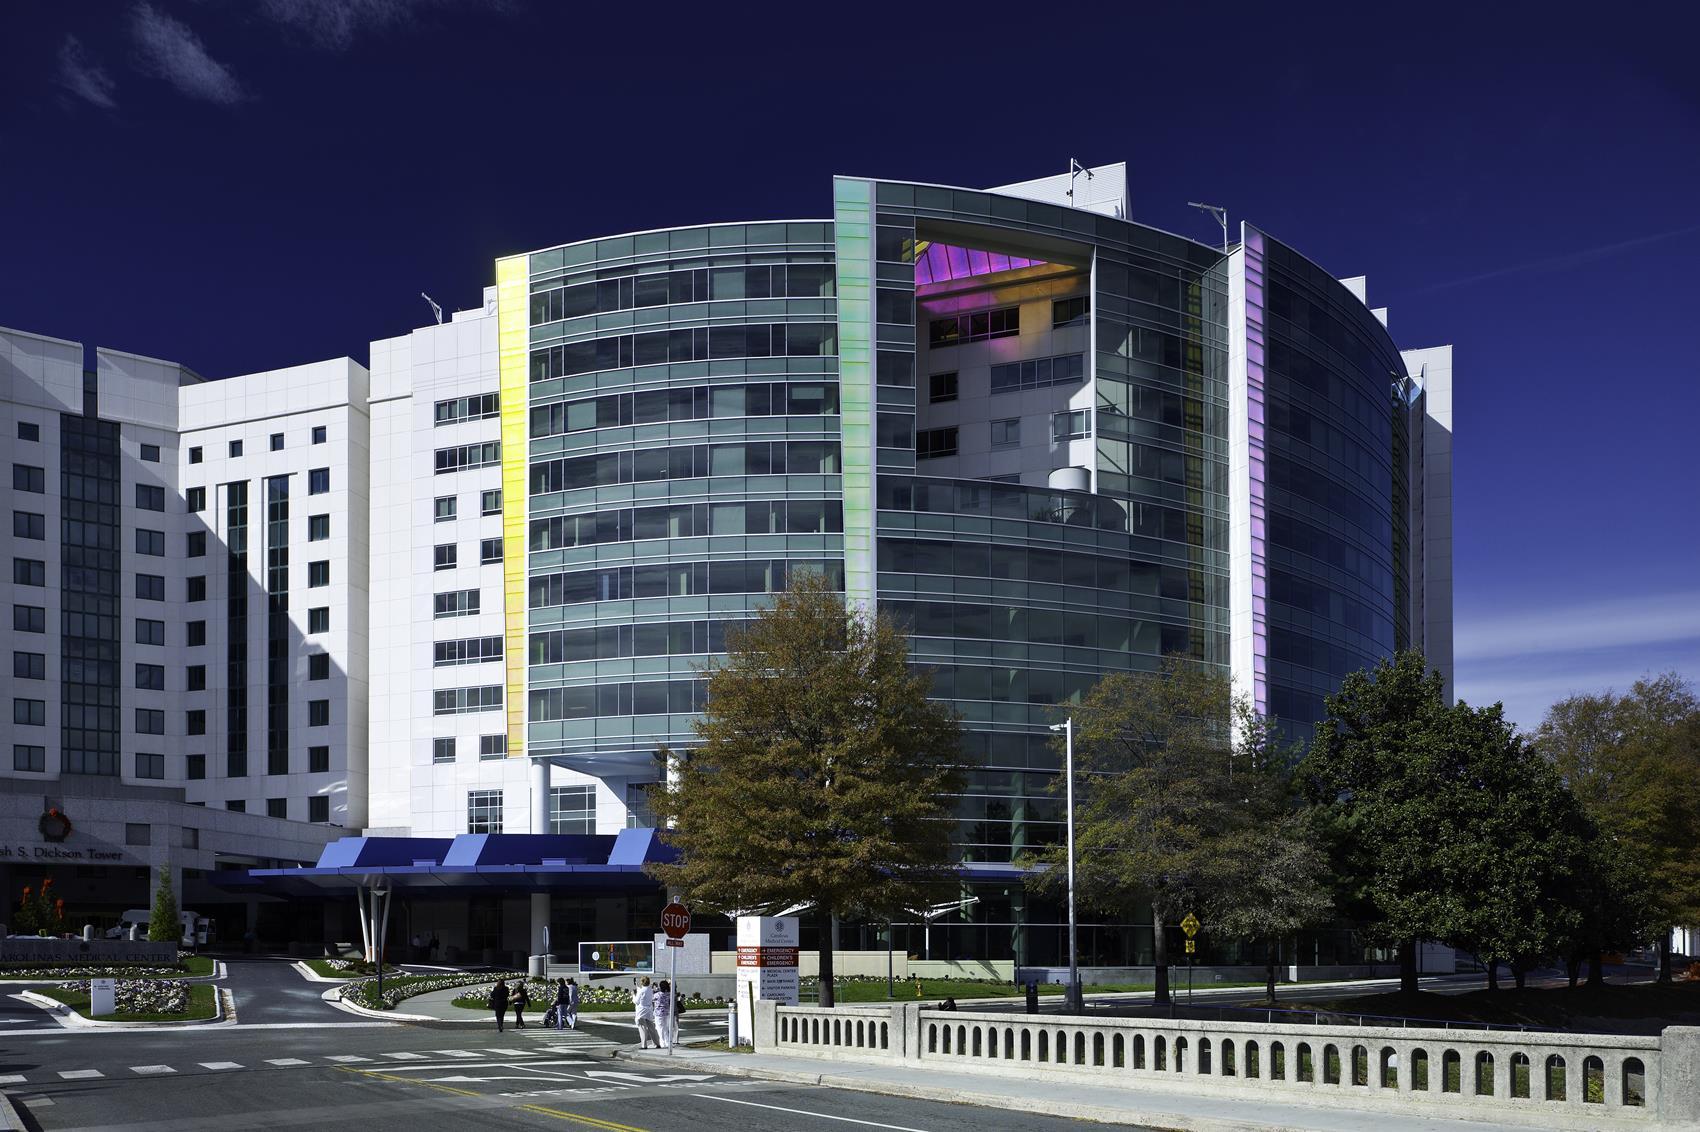 Exterior view of Levine Children's Hospital